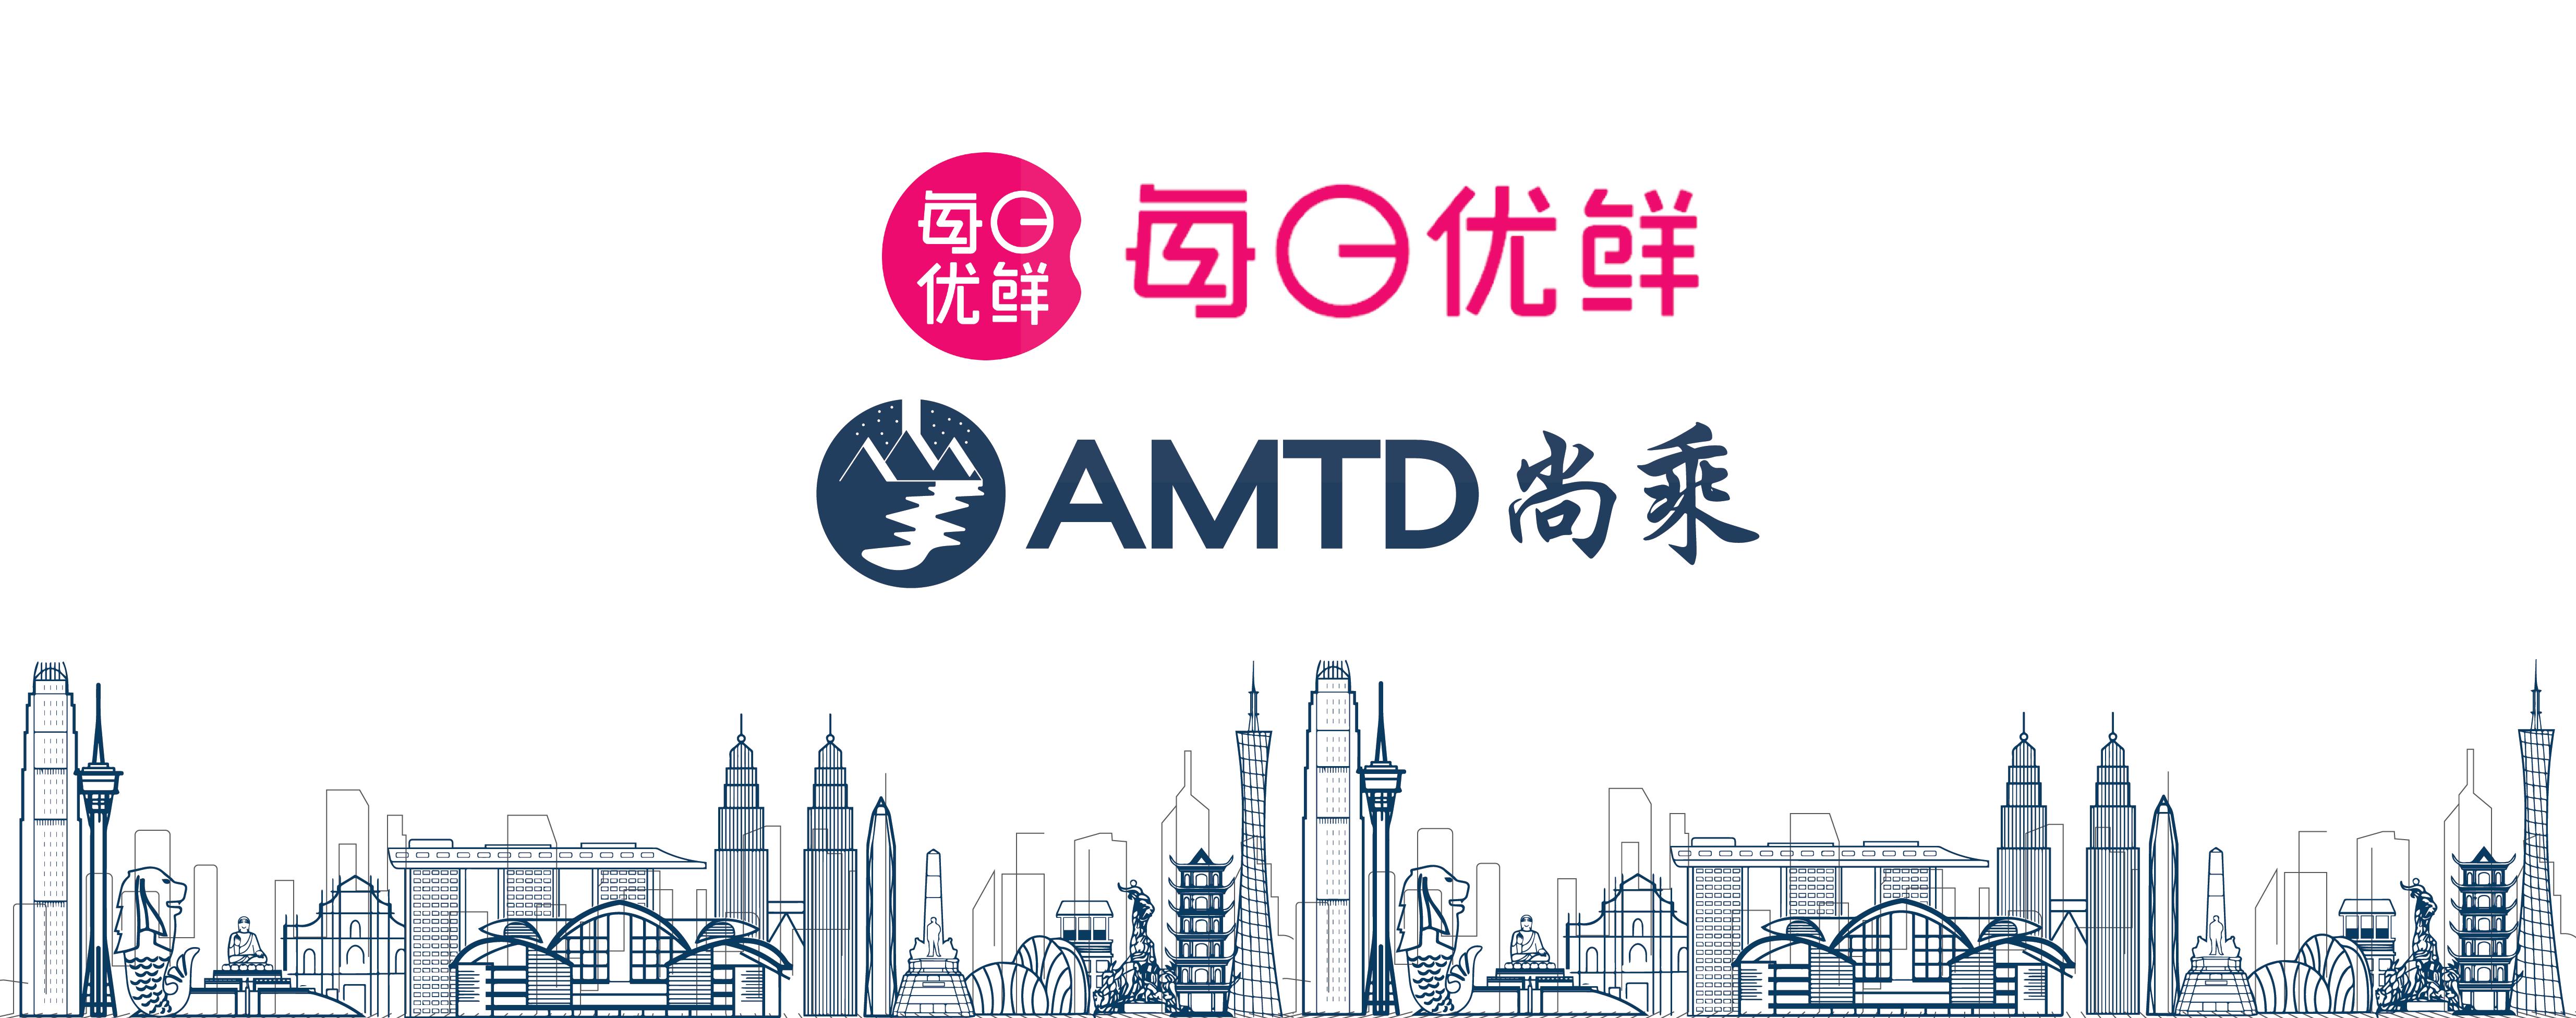 AMTD Deals | AMTD Completes the US IPO of Missfresh on NASDAQ